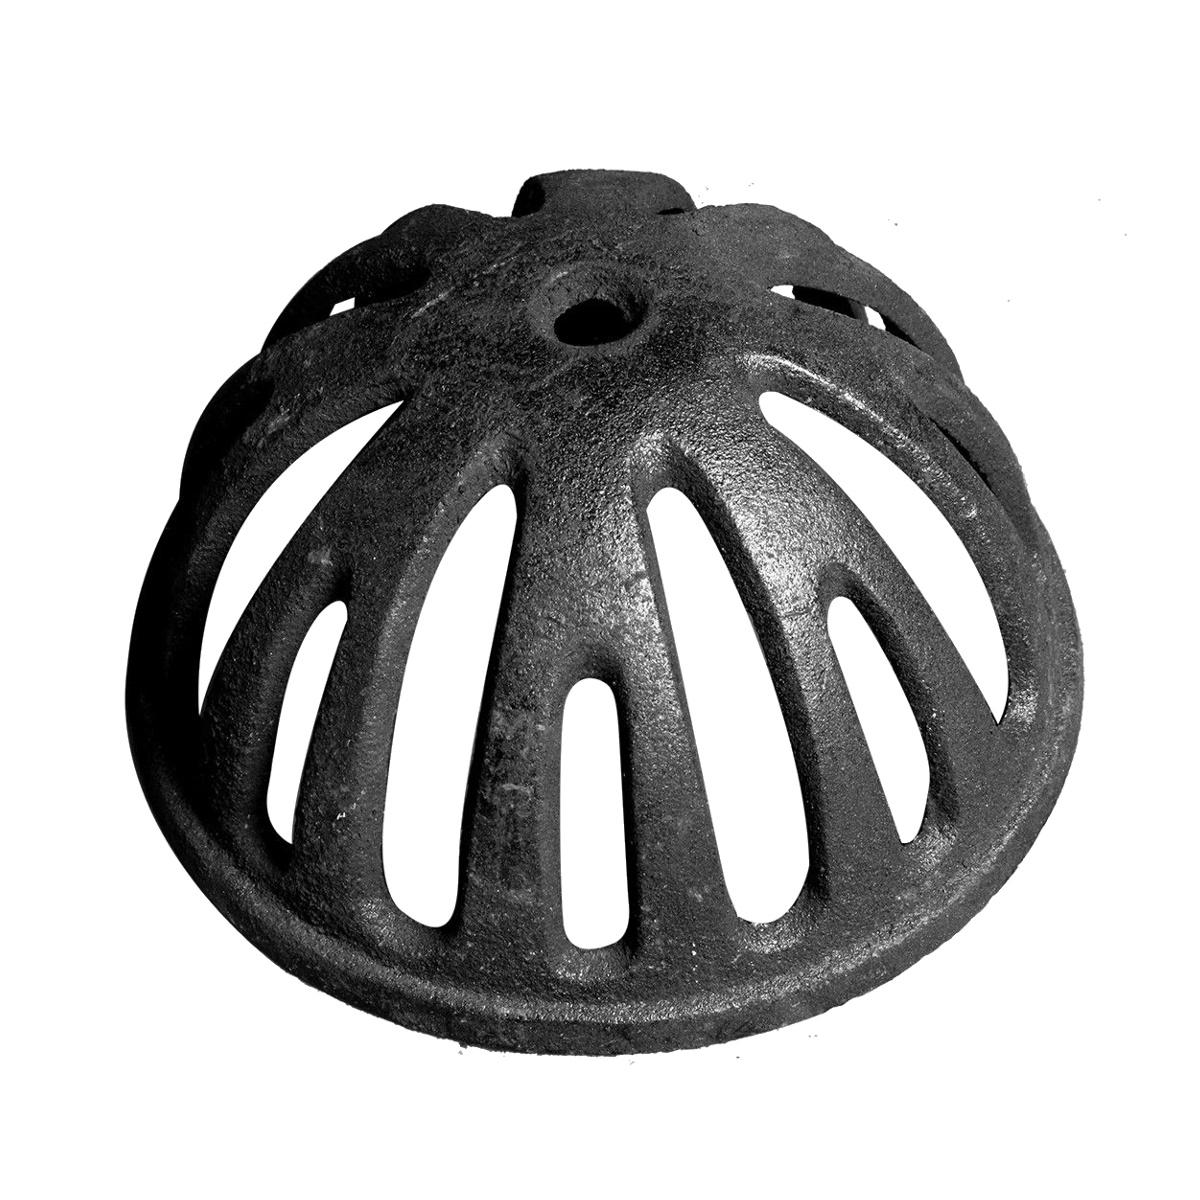 Ralo Semi Esférico Tipo Abacaxi 50mm Diâmetro 2 Polegadas  - Panela de Ferro Fundido